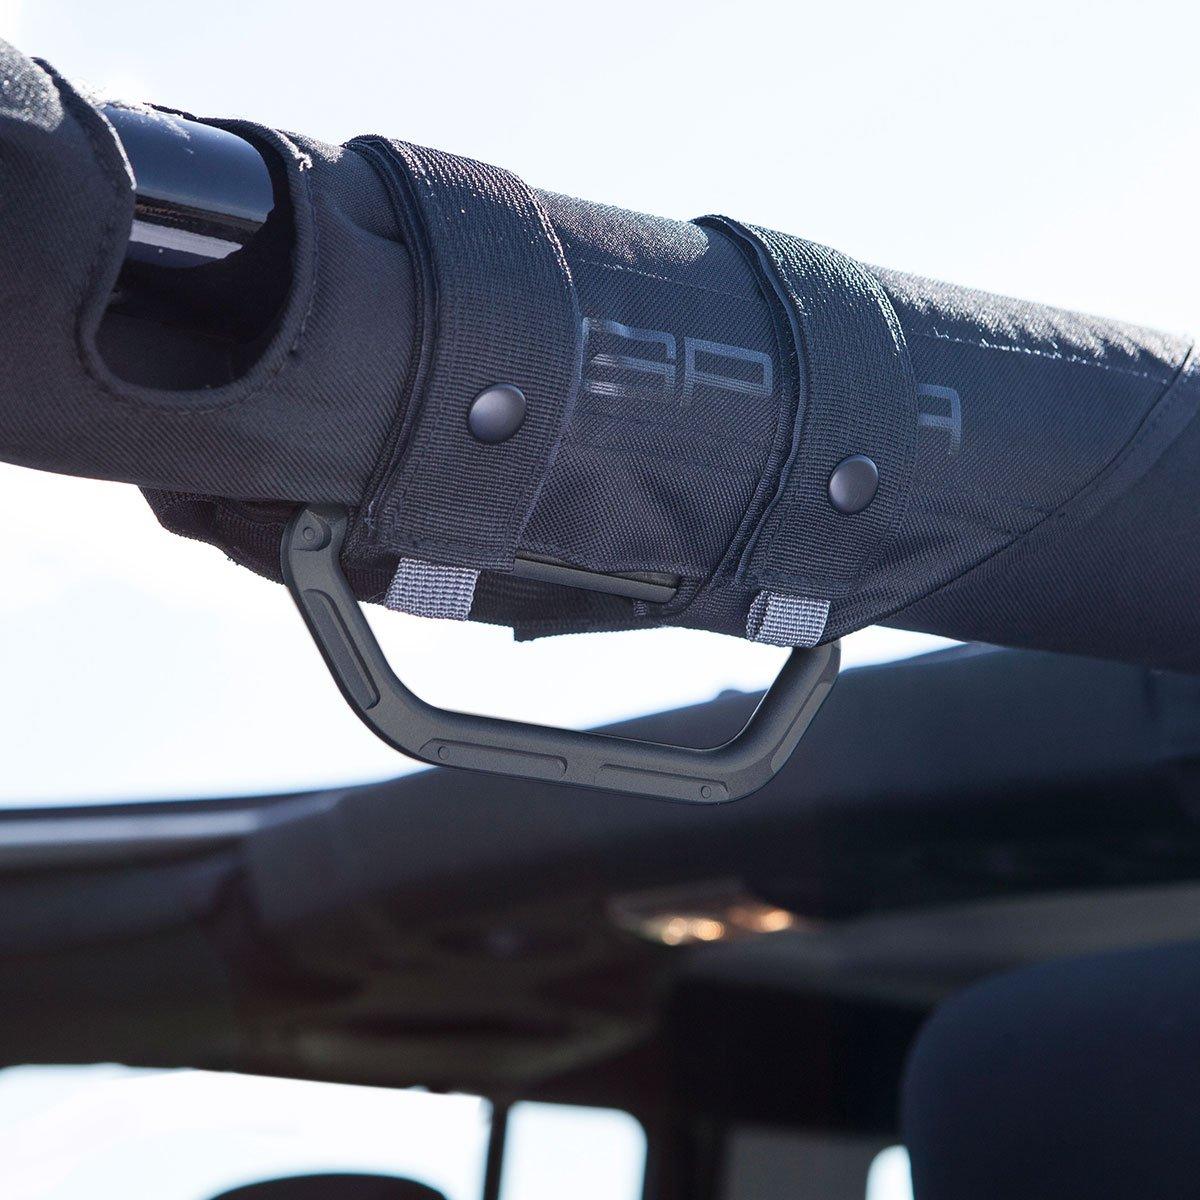 GPCA Products GPCA Wrangler Metal Grab Handle Jet Black - Single GP-Grip LITE for Jeep JK JKU JL Sports//Sahara//Freedom//Rubicon X Unlimited X 2DR// 4DR 2007-2019 with 3 Padded roll bar